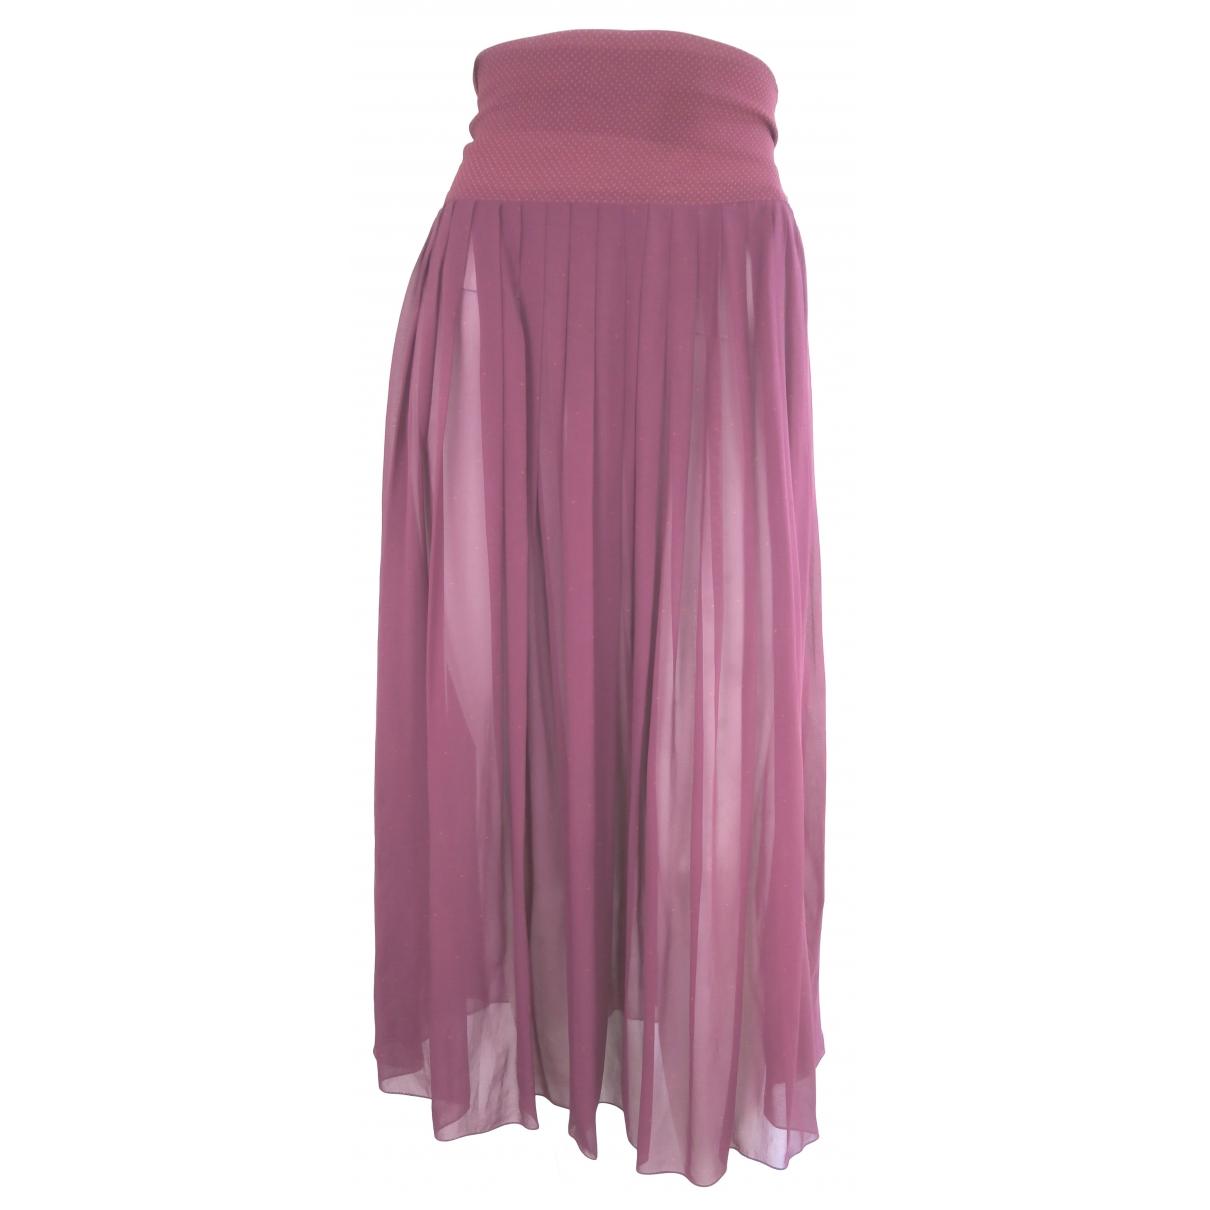 Gianni Versace \N Silk skirt for Women 44 IT